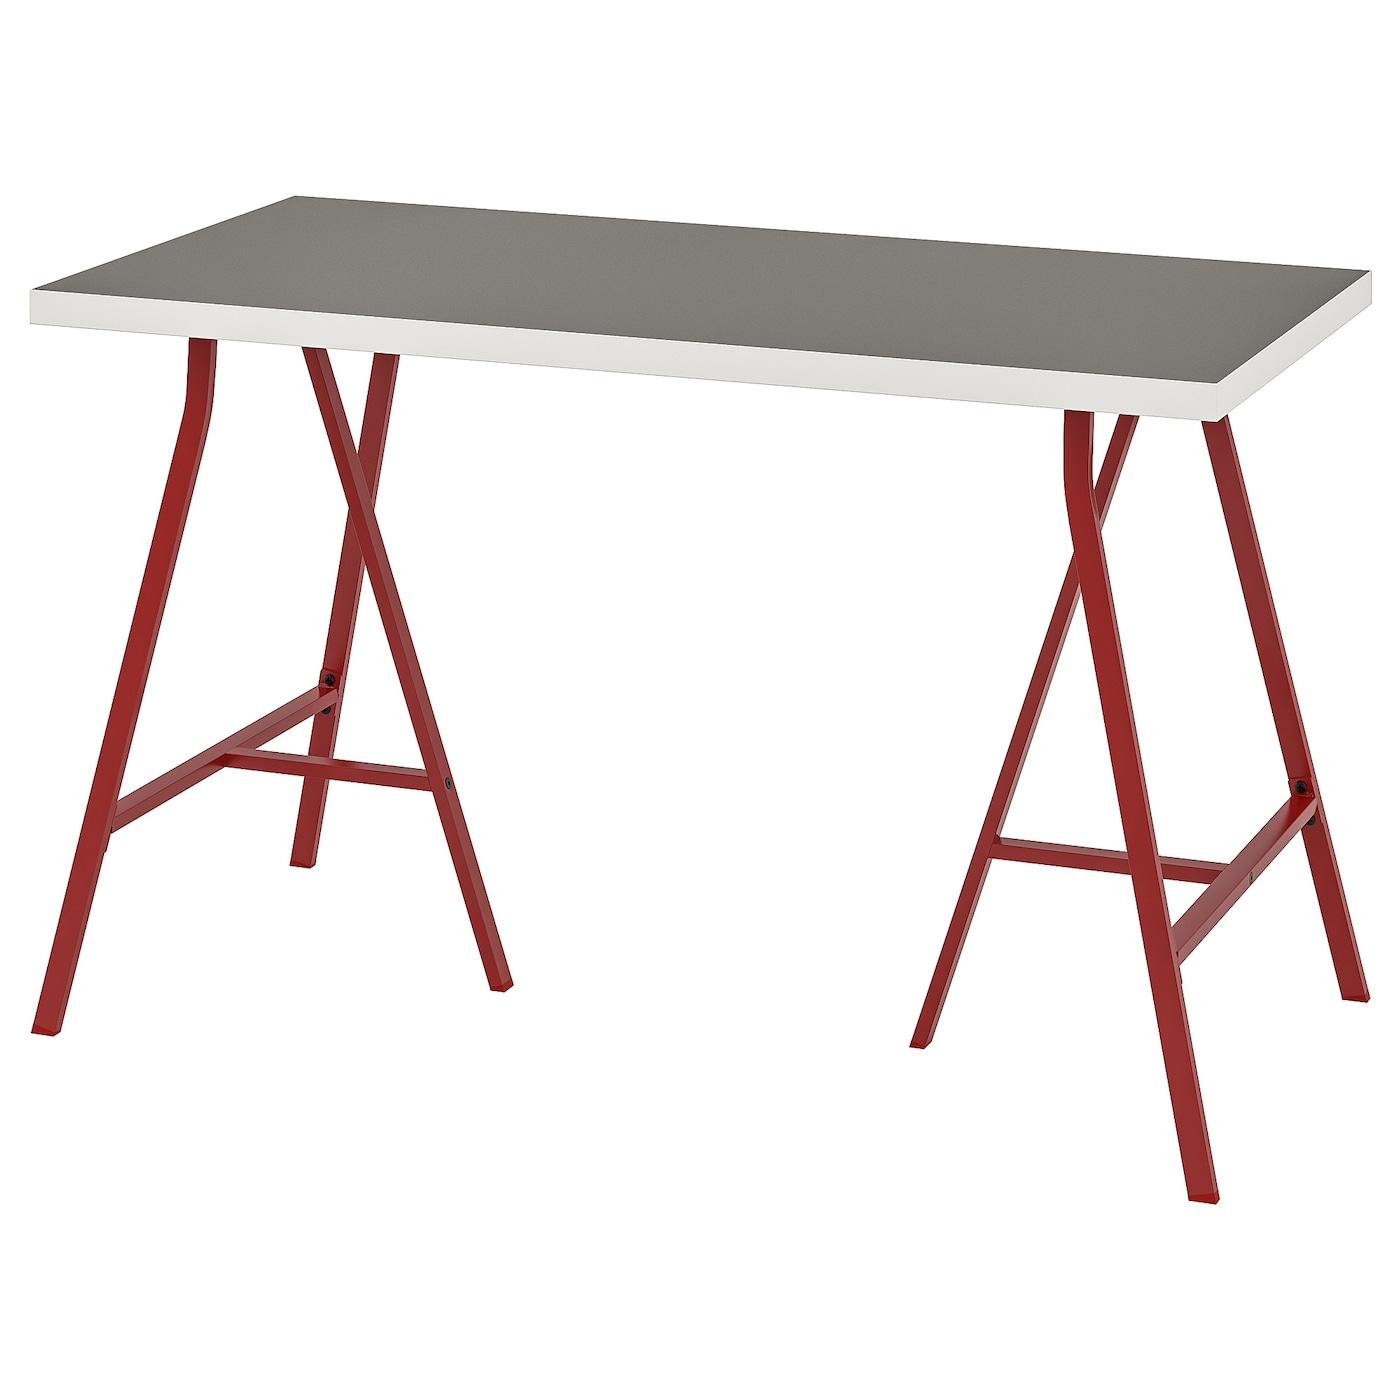 Linnmon Tabletop Light Gray White 47 1 4x23 5 8 Ikea